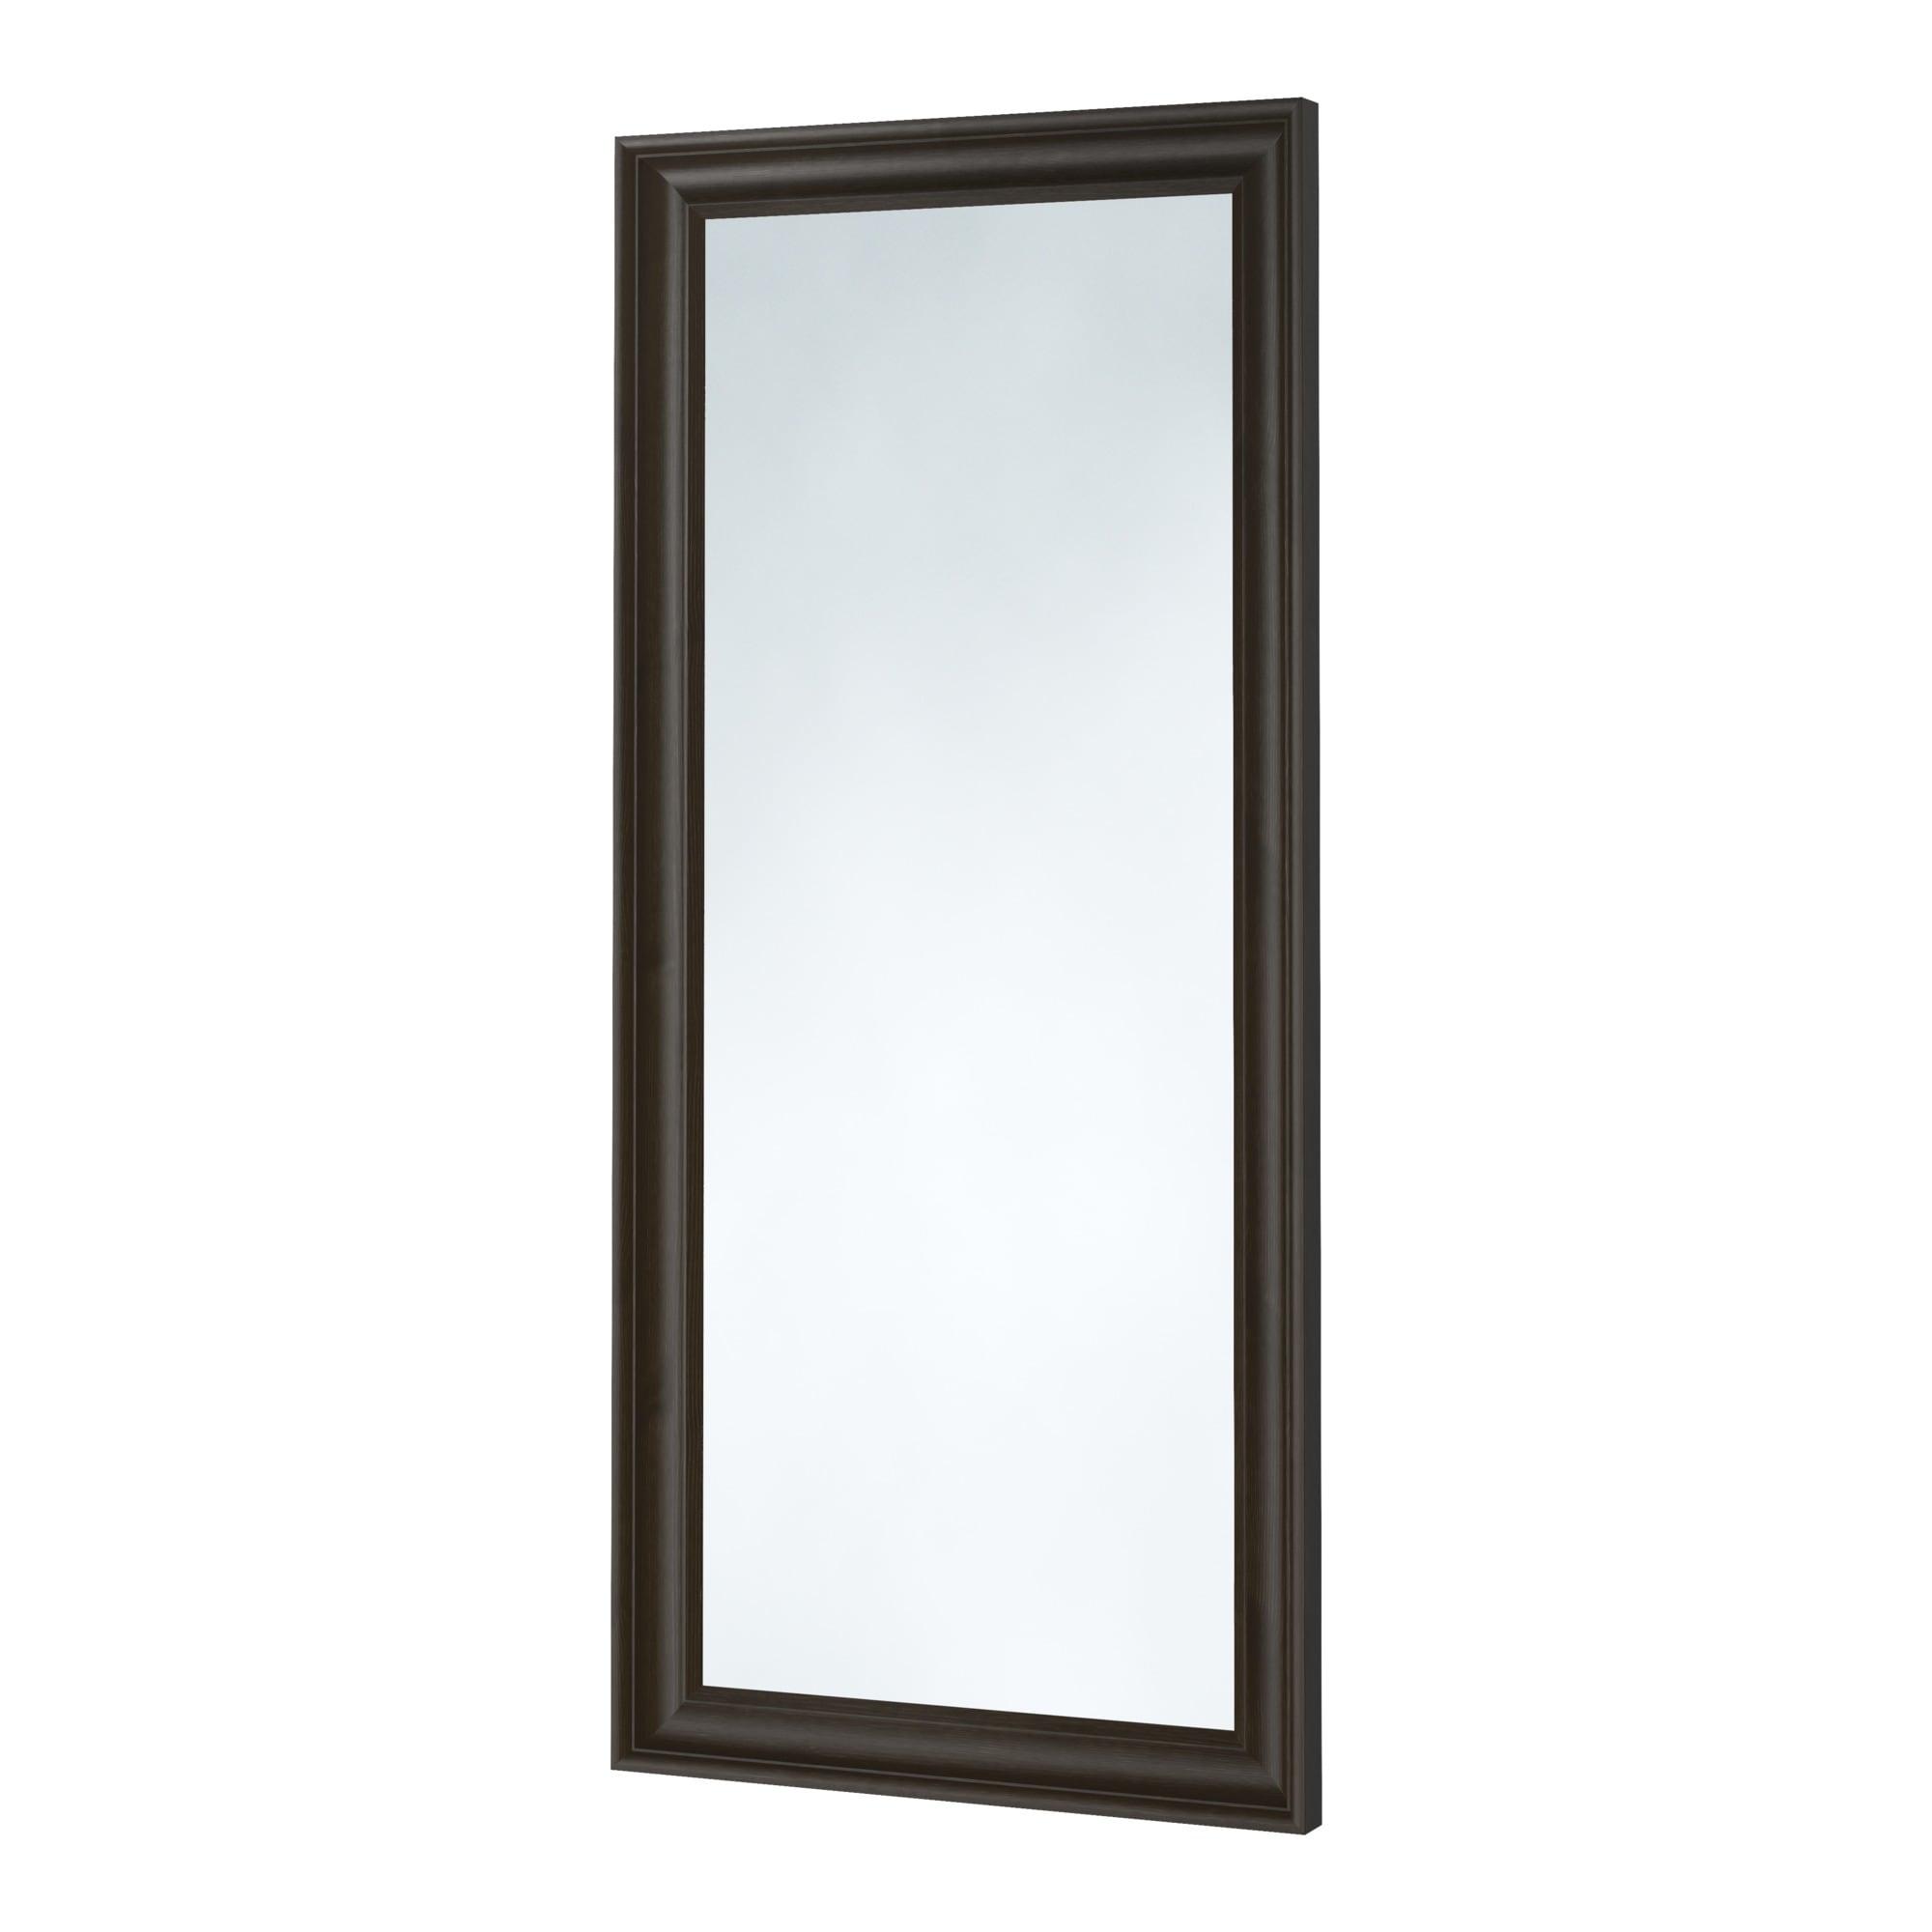 Hemnes Mirror Black Brown 29 1 8x65 Ikea Mirror Wall